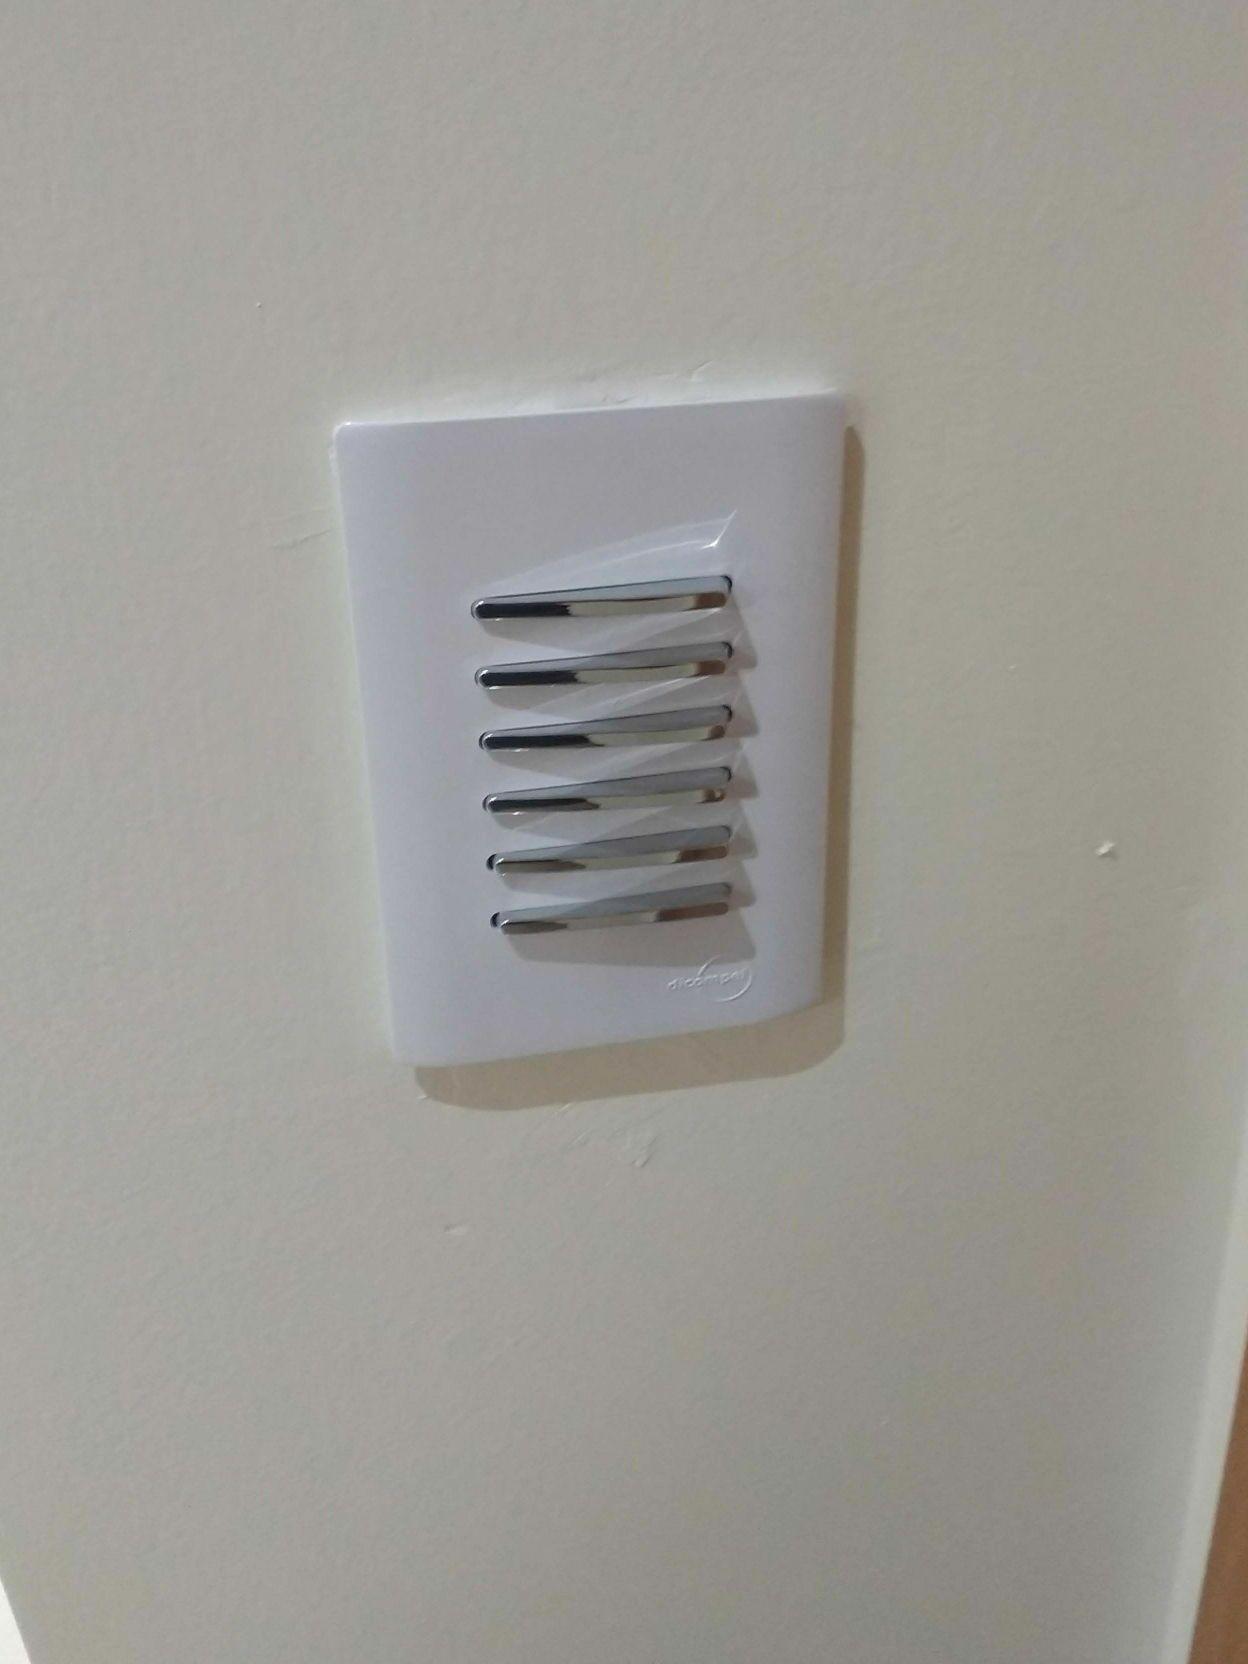 interruptores para acionamento de spots e fita led